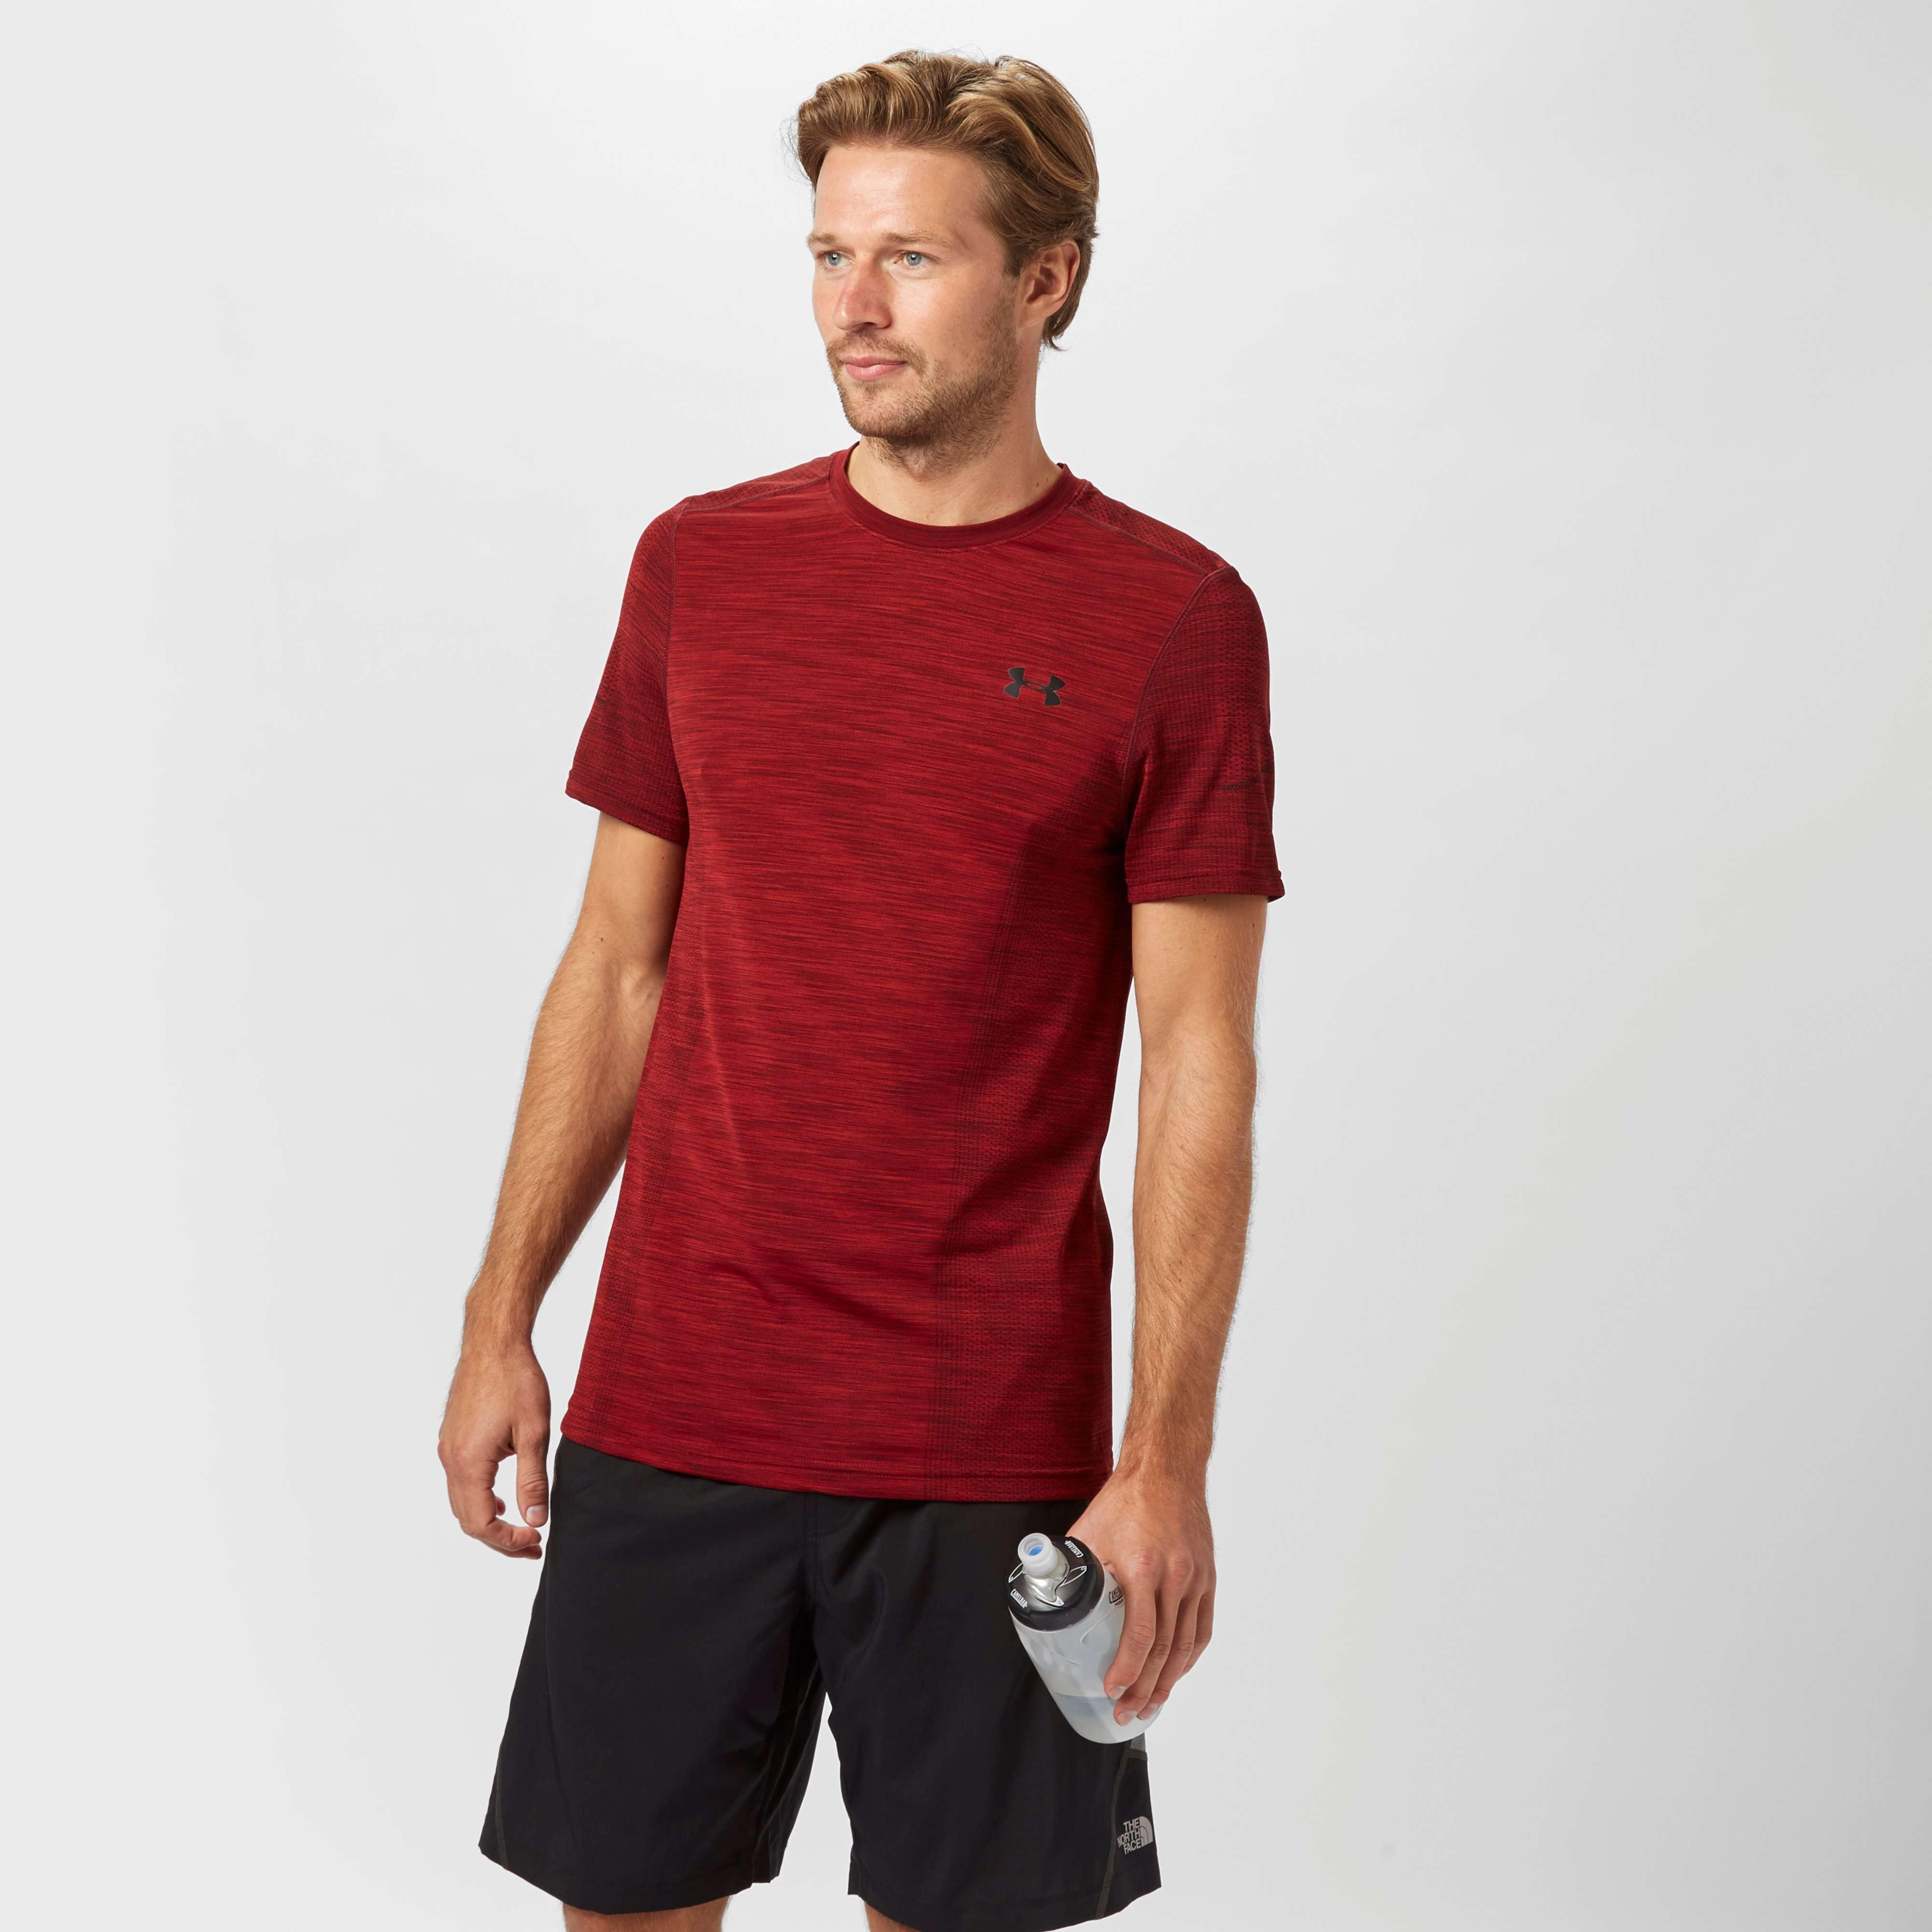 UNDER ARMOUR Men's Threadborne Short Sleeve T-Shirt